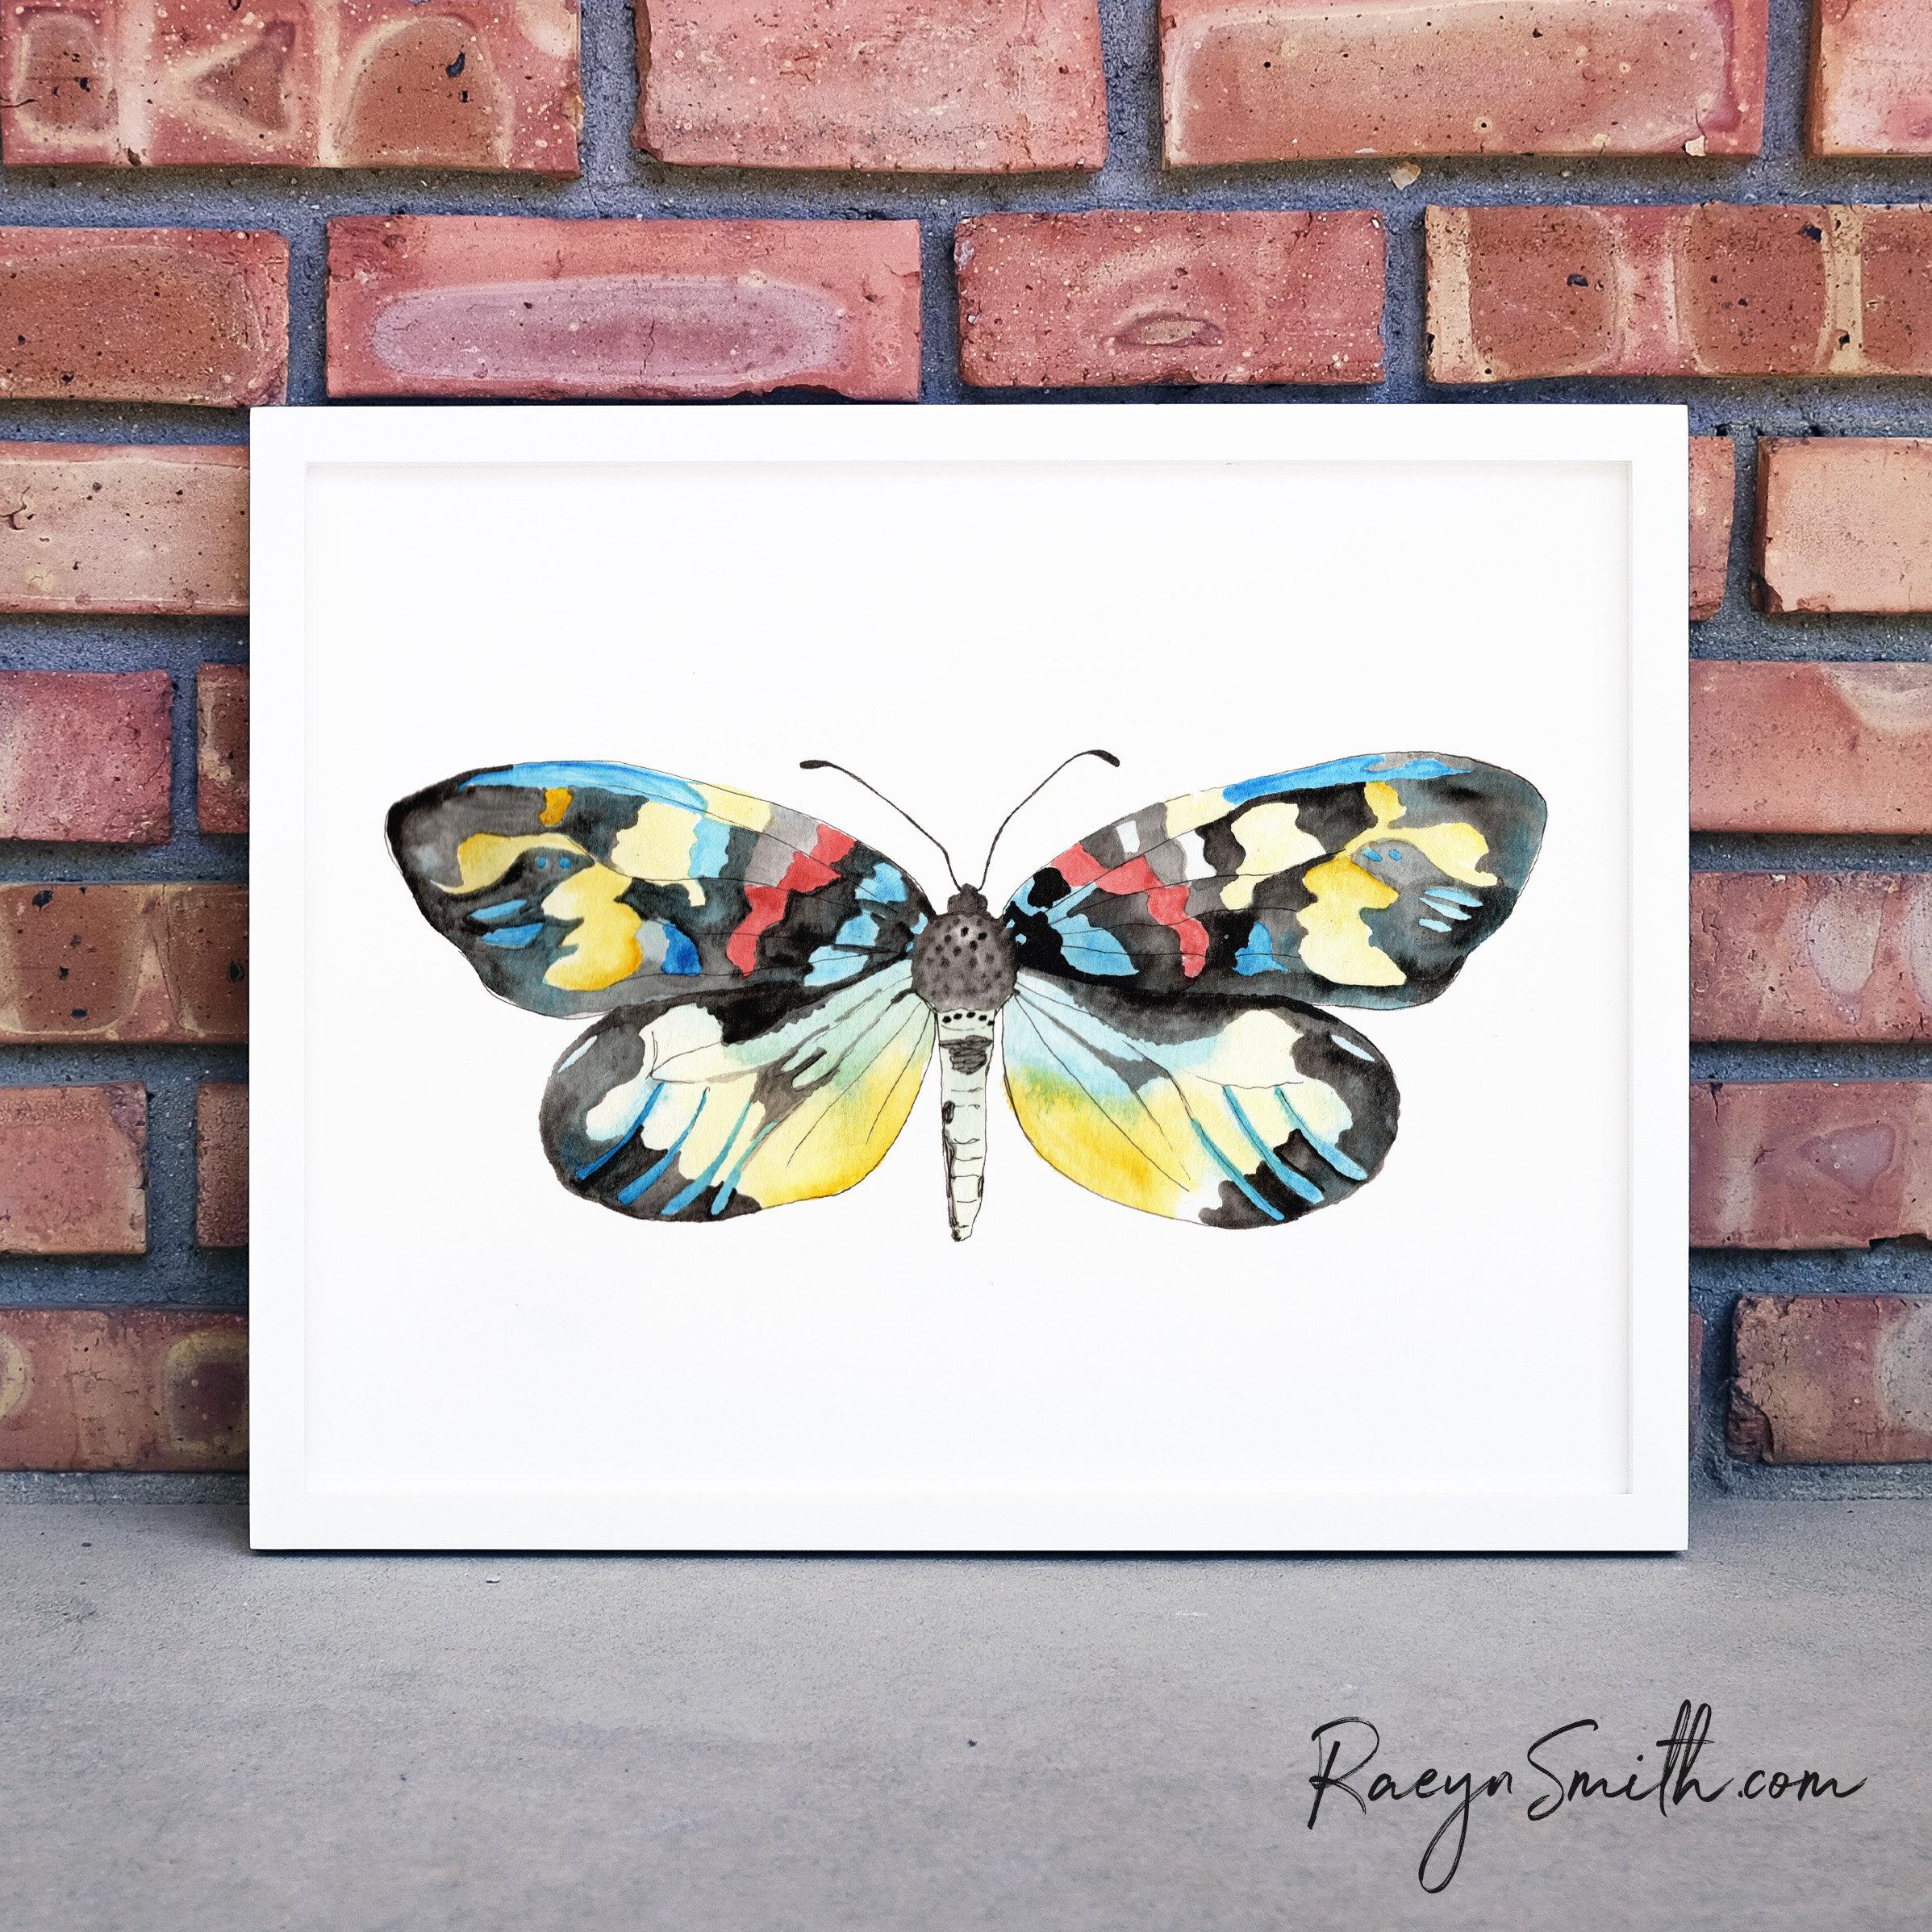 Erasmia Pulchera Chinesis - Moth - Painted by Raeyn Smith. Visit RAEYNSMITH.COM